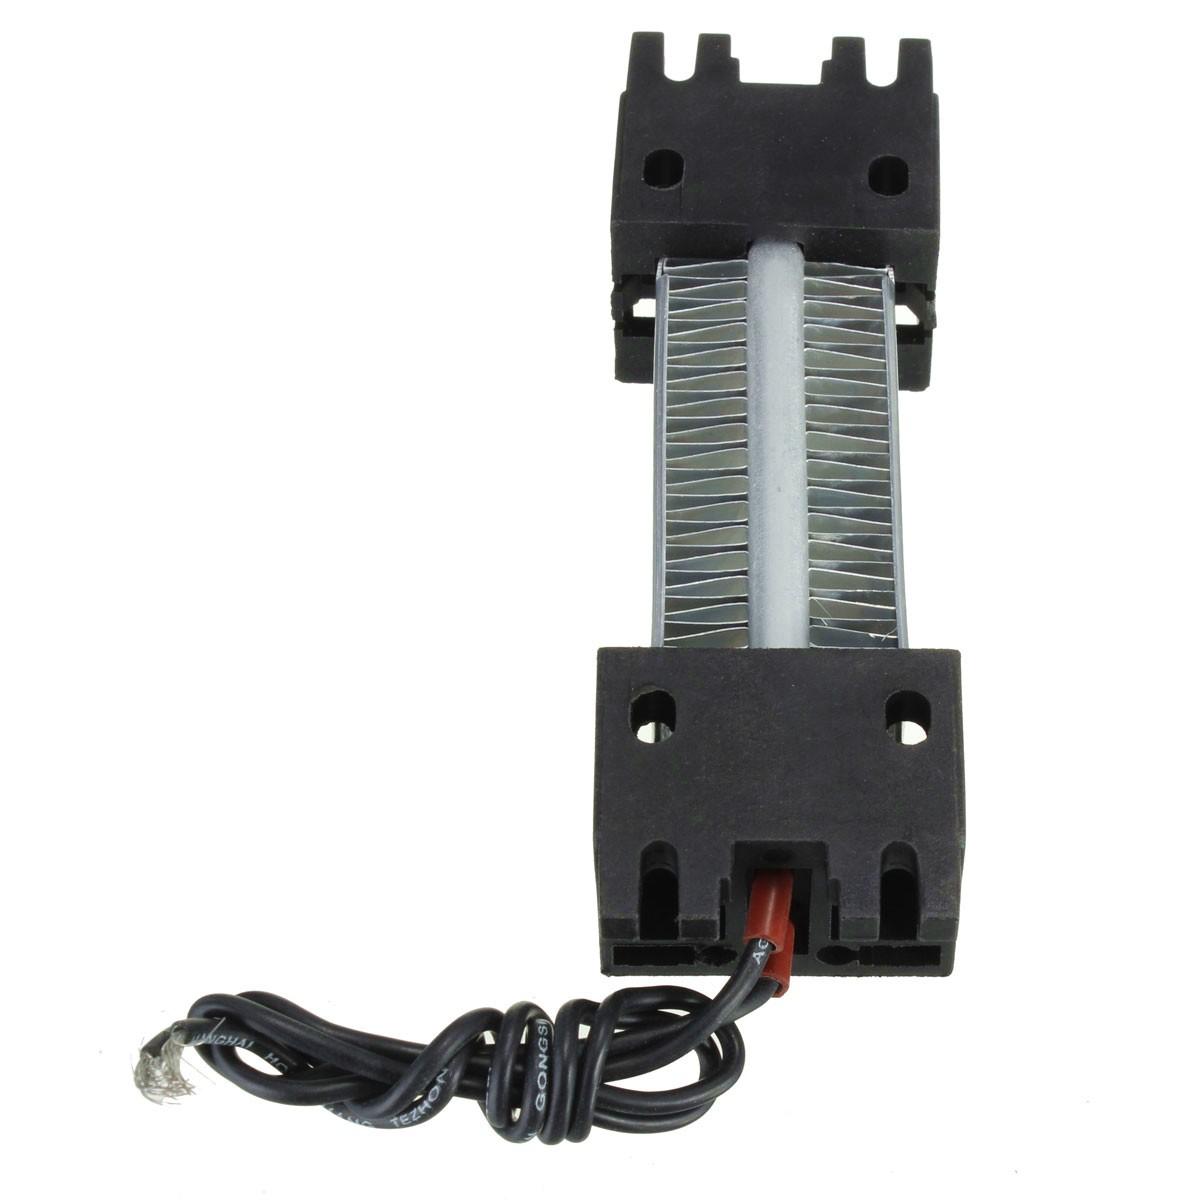 100w 220v Insulated Ptc Ceramic Air Heater Ptc Heating